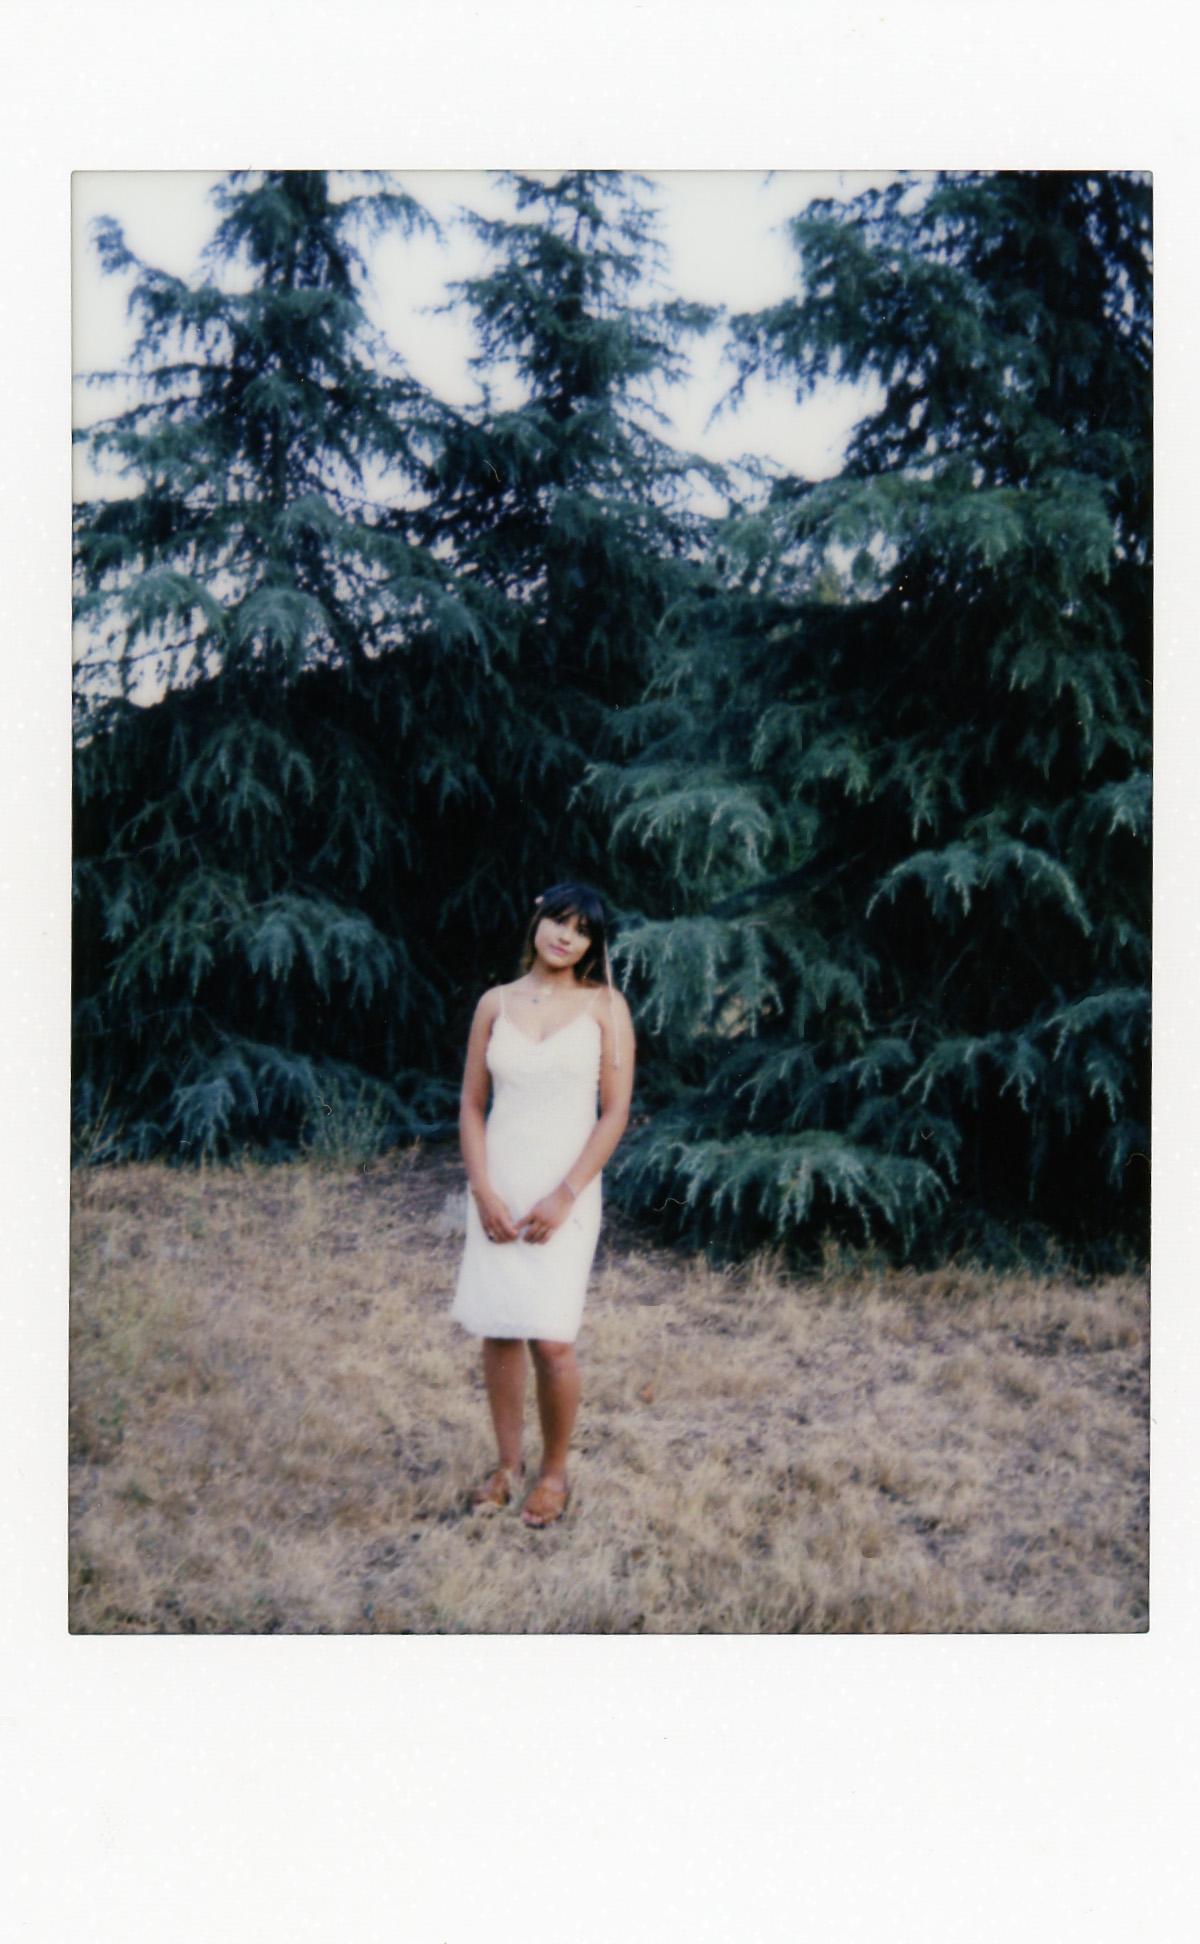 Forest Girl | Leica Sofort | Angela Pailevanian